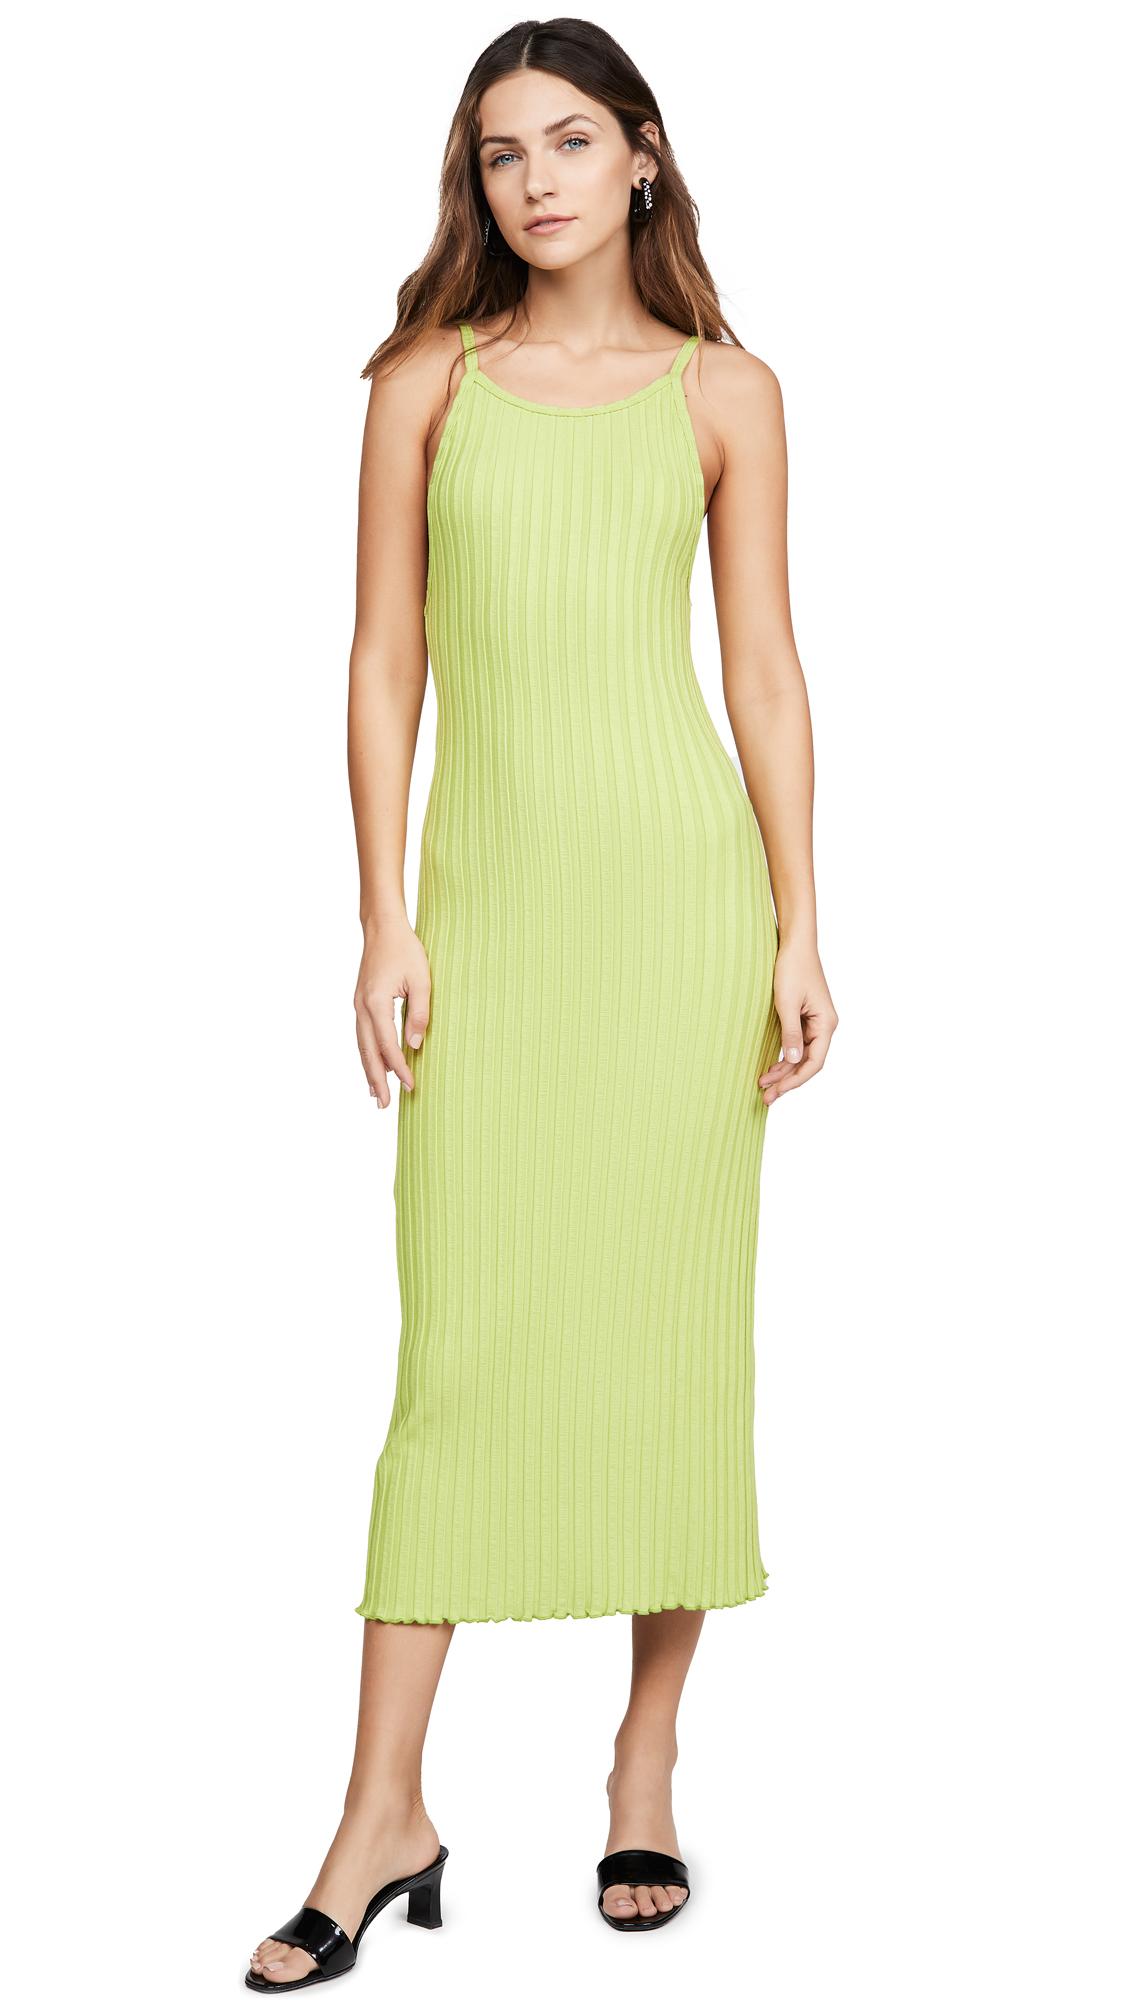 Photo of Simon Miller Rib Matomi Dress - shop Simon Miller Clothing, Dresses online